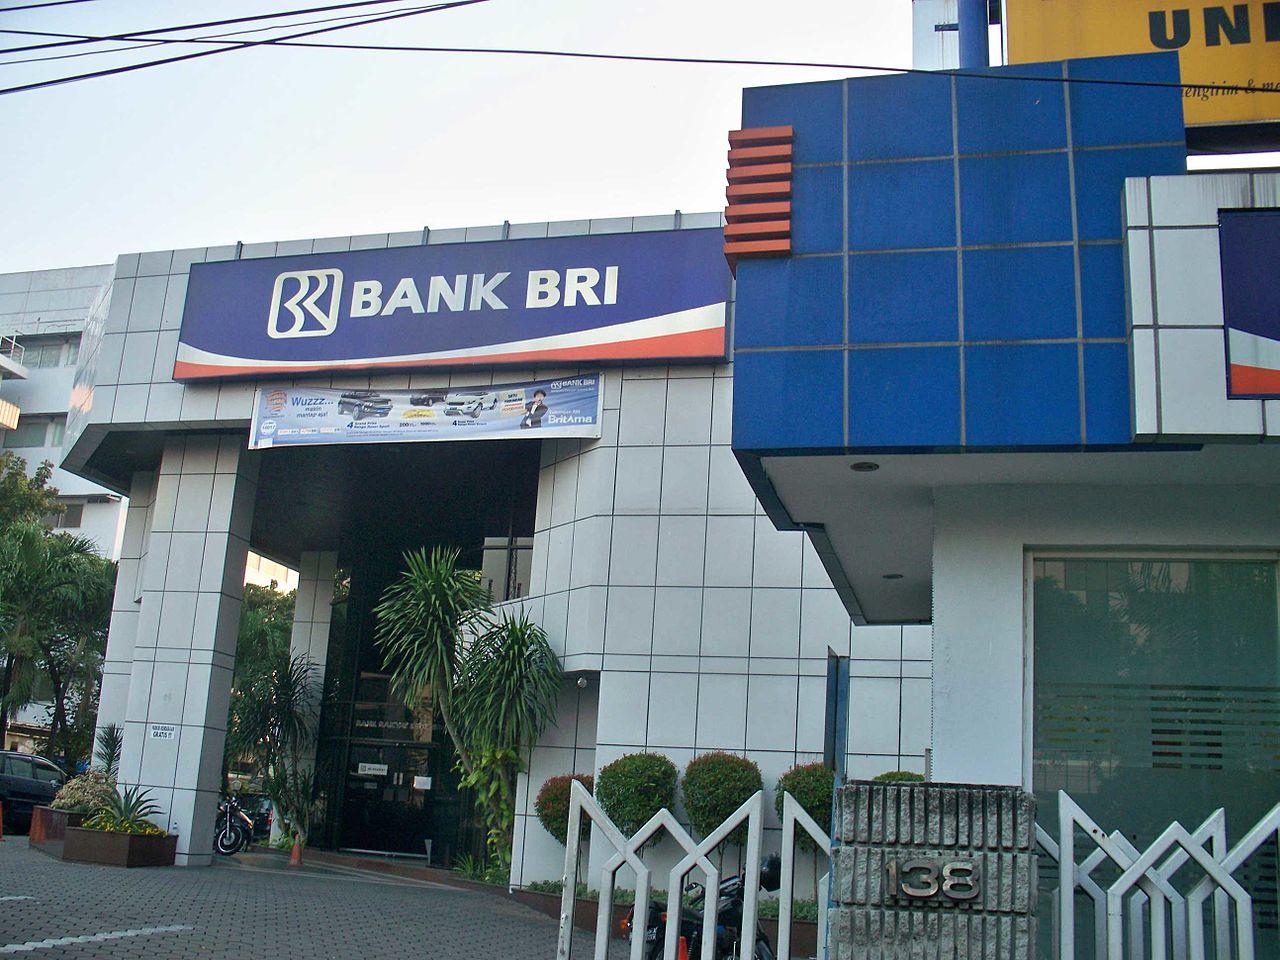 File:Bank BRI Kramat Raya - panoramio.jpg - Wikimedia Commons